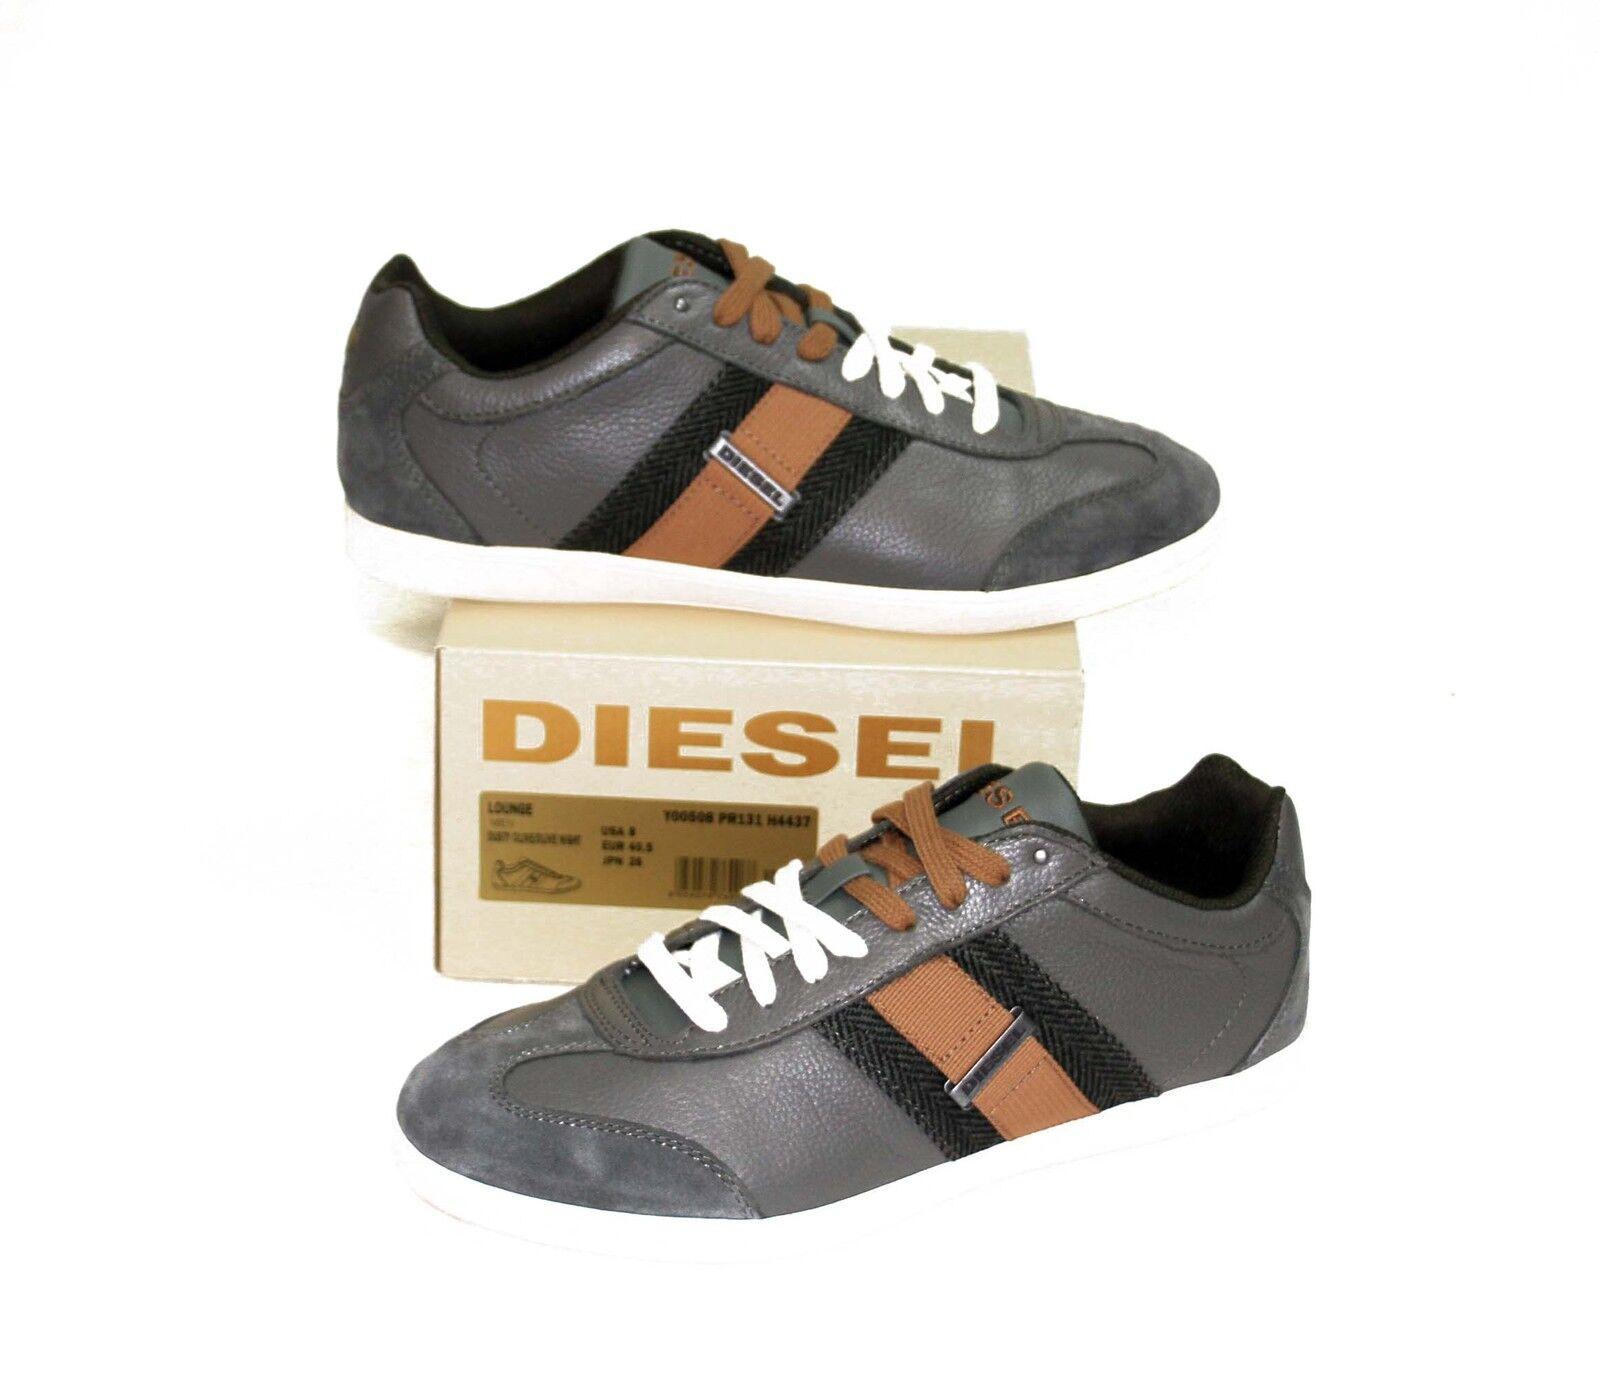 Scarpe casual da uomo  DIESEL Brand uomo Lounge Olive Orange Leather Casual Sport Shoes Sneakers in Box